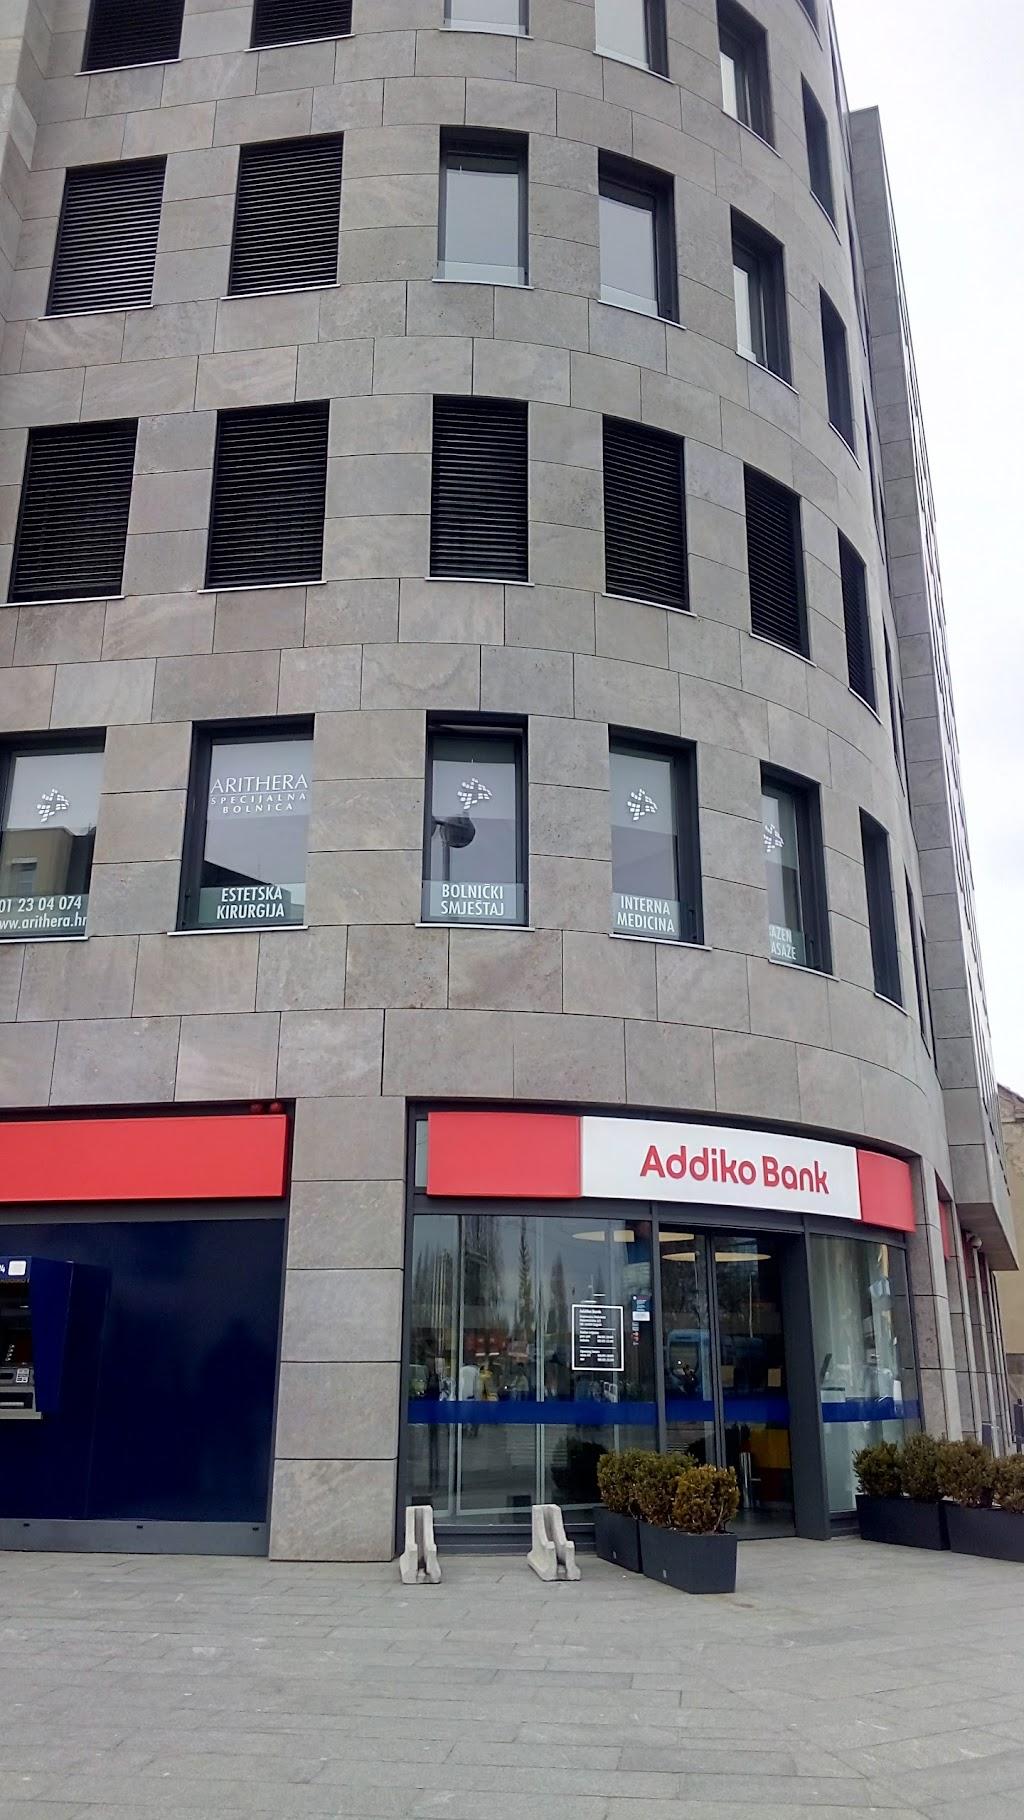 Addiko Bank Poslovnica Zagreb Maksimir Zagreb Maksimirska Cesta Telefon 01 6030 000 Radno Vrijeme